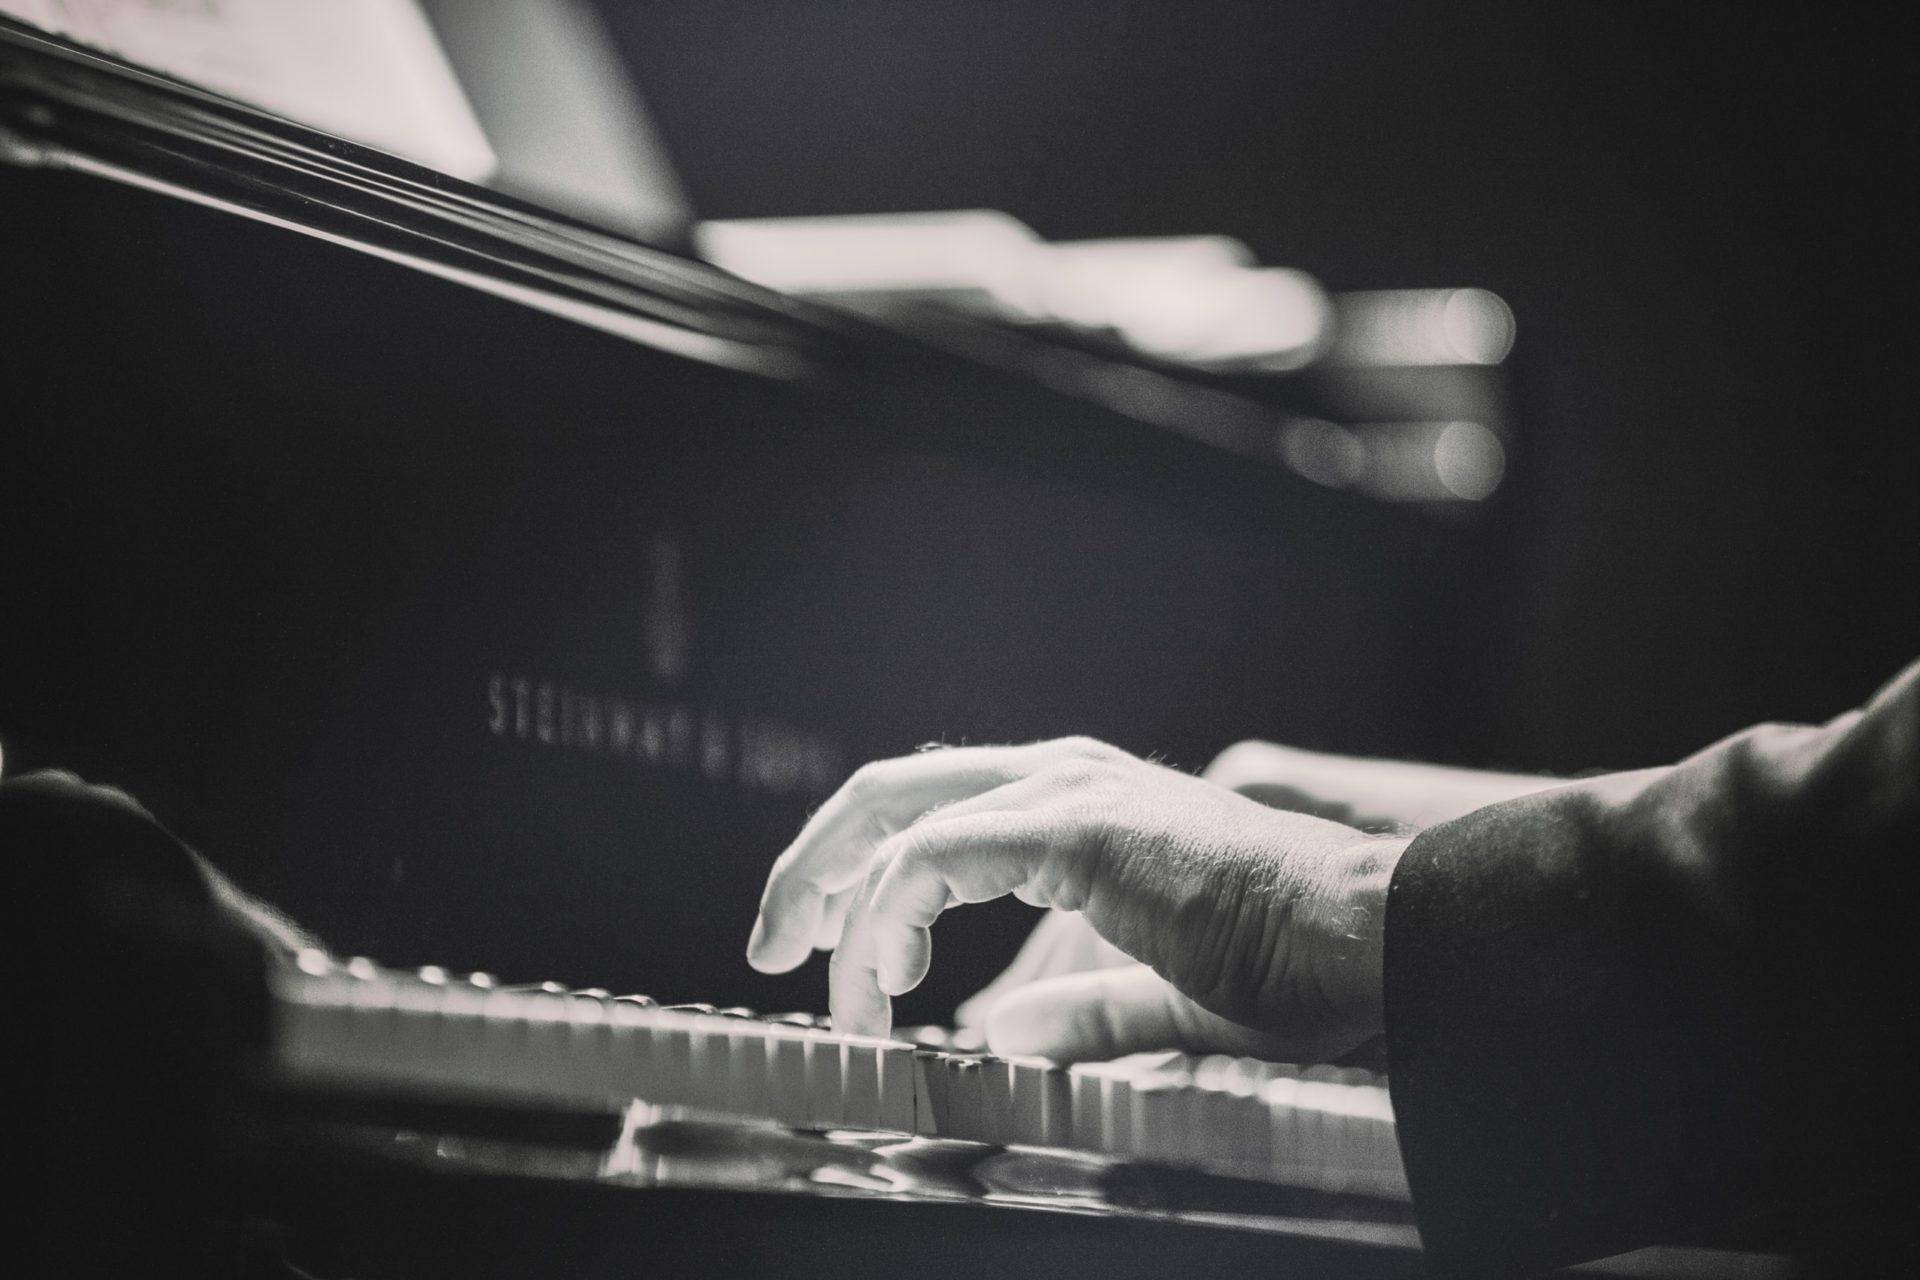 Peter Beets & the Henk Meutgeert New Jazz Orchestra